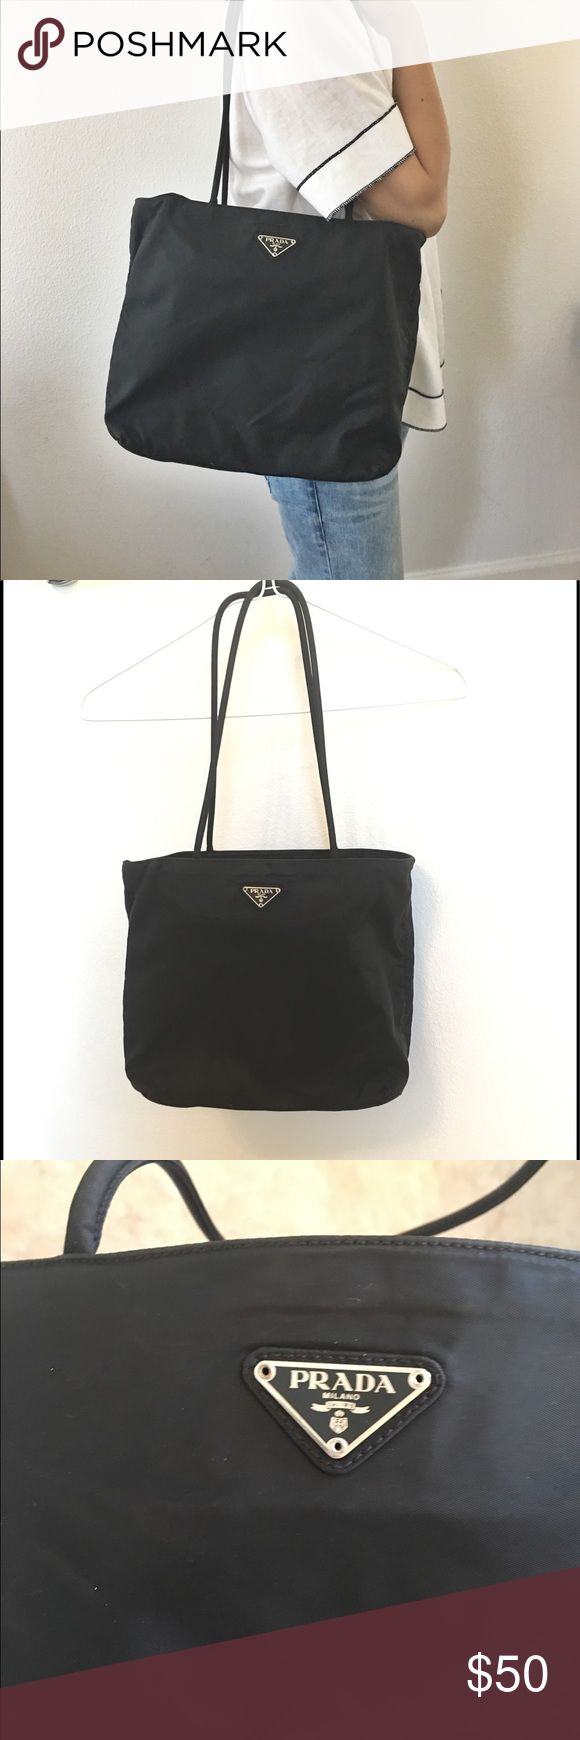 nylon tote bags with zipper closure